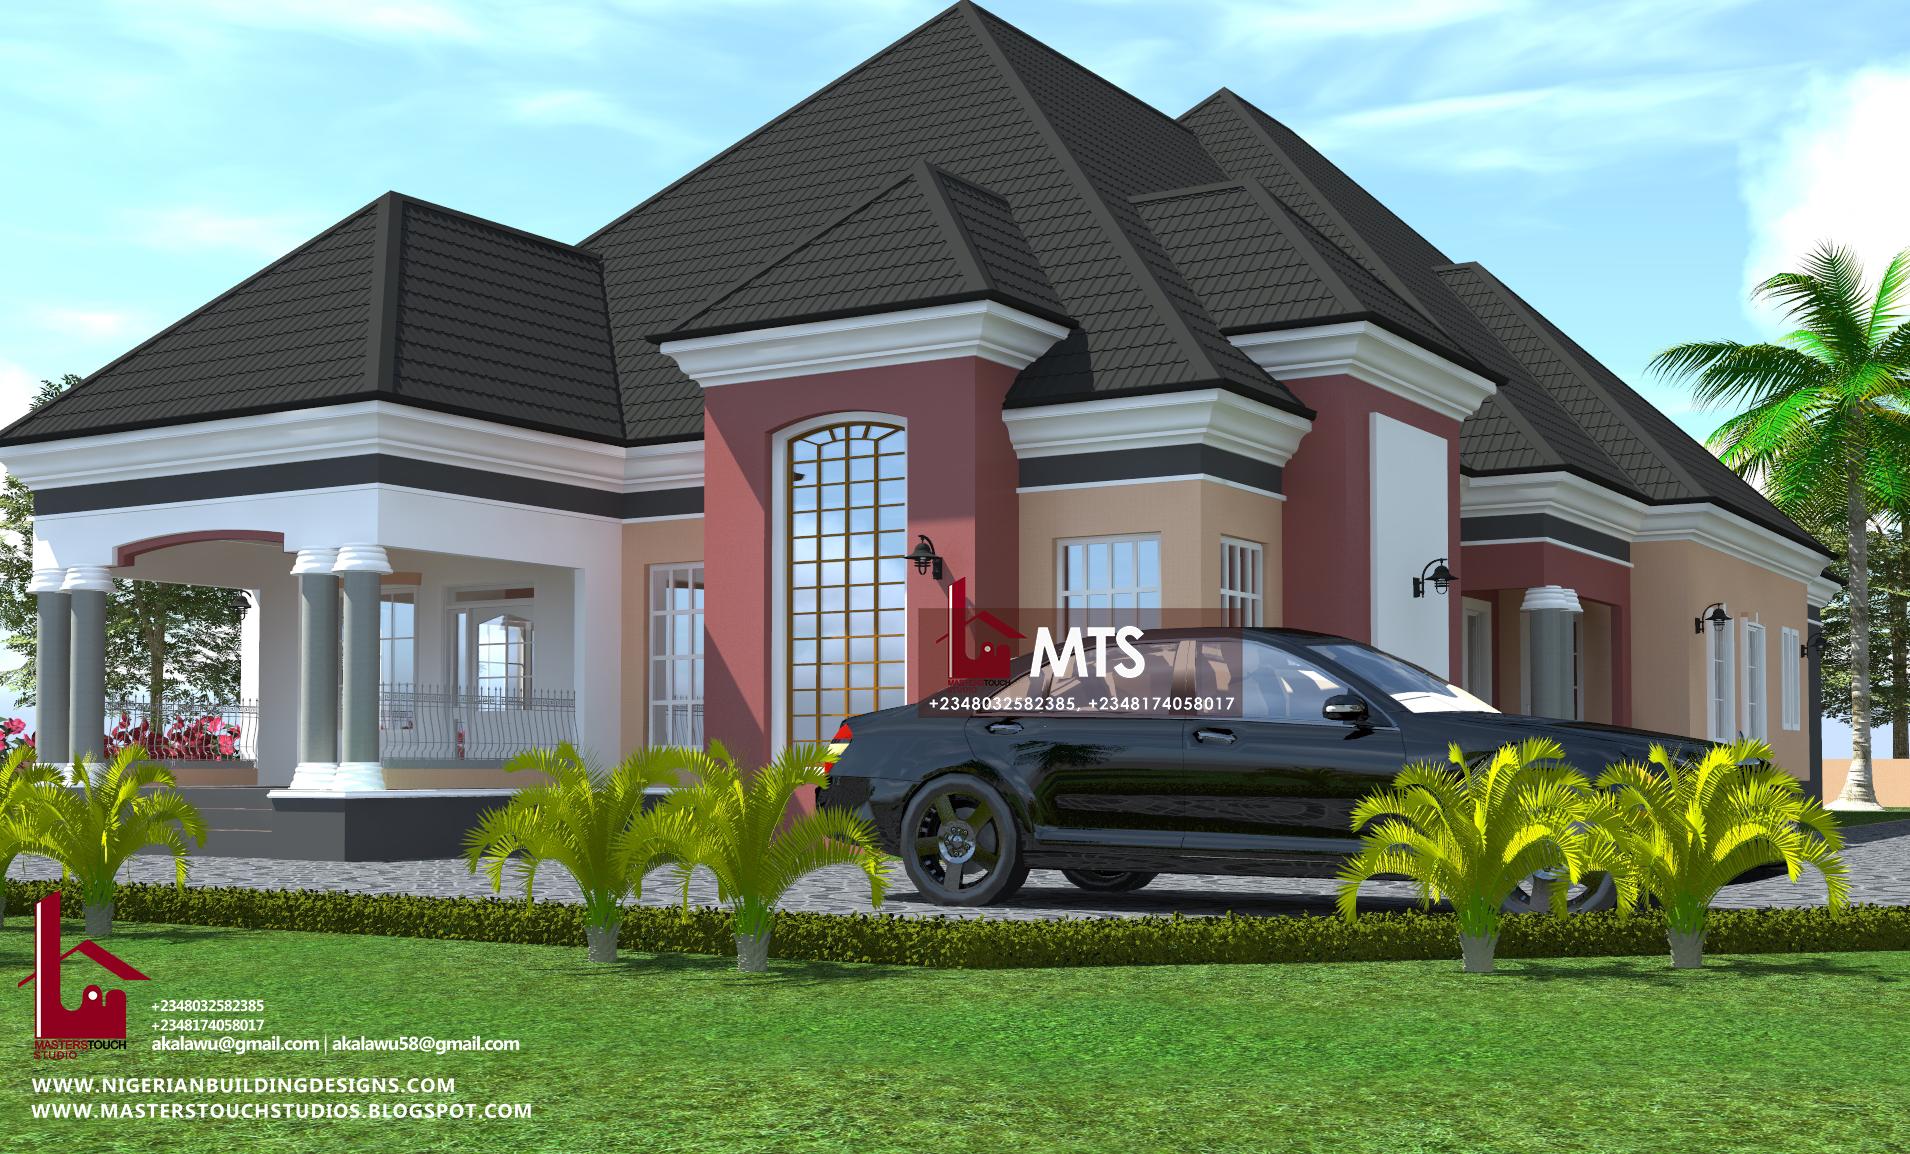 5 Bedroom Bungalow Rf 5005 Nigerian Building Designs